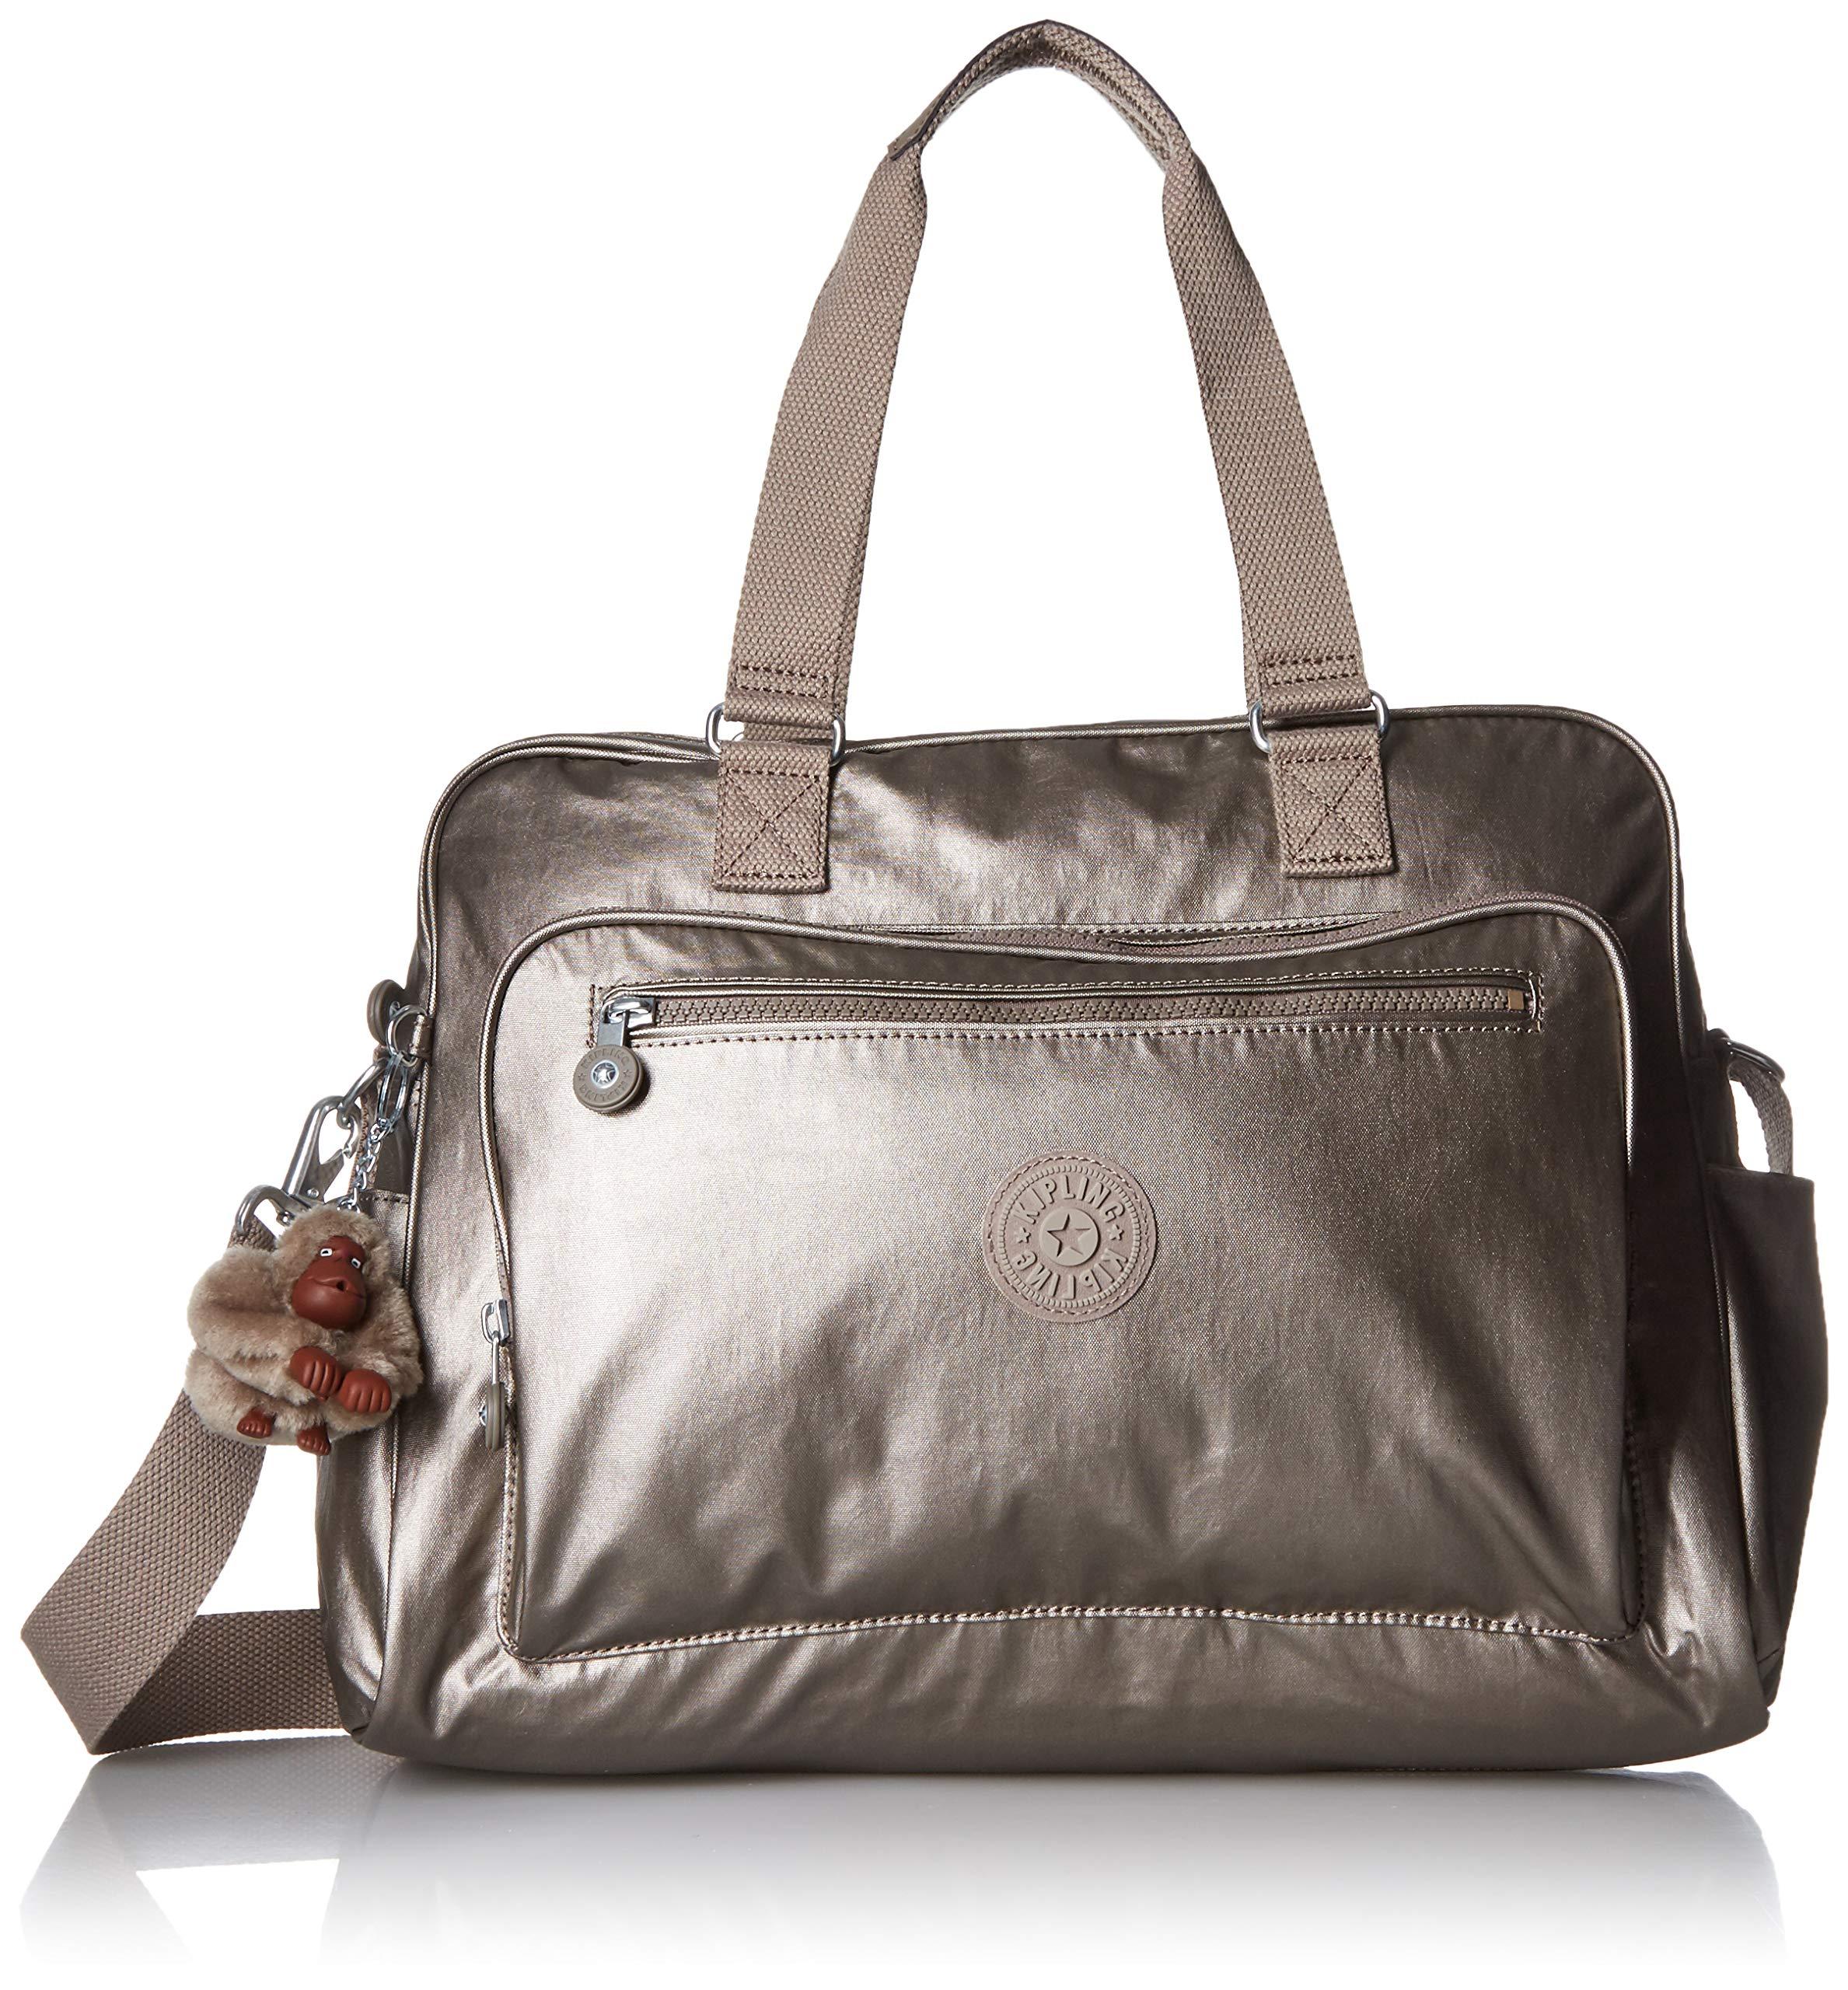 Kipling Women's Alanna Diaper Bag, Stroller Clips, Zip Closure, metallic pewter, One Size